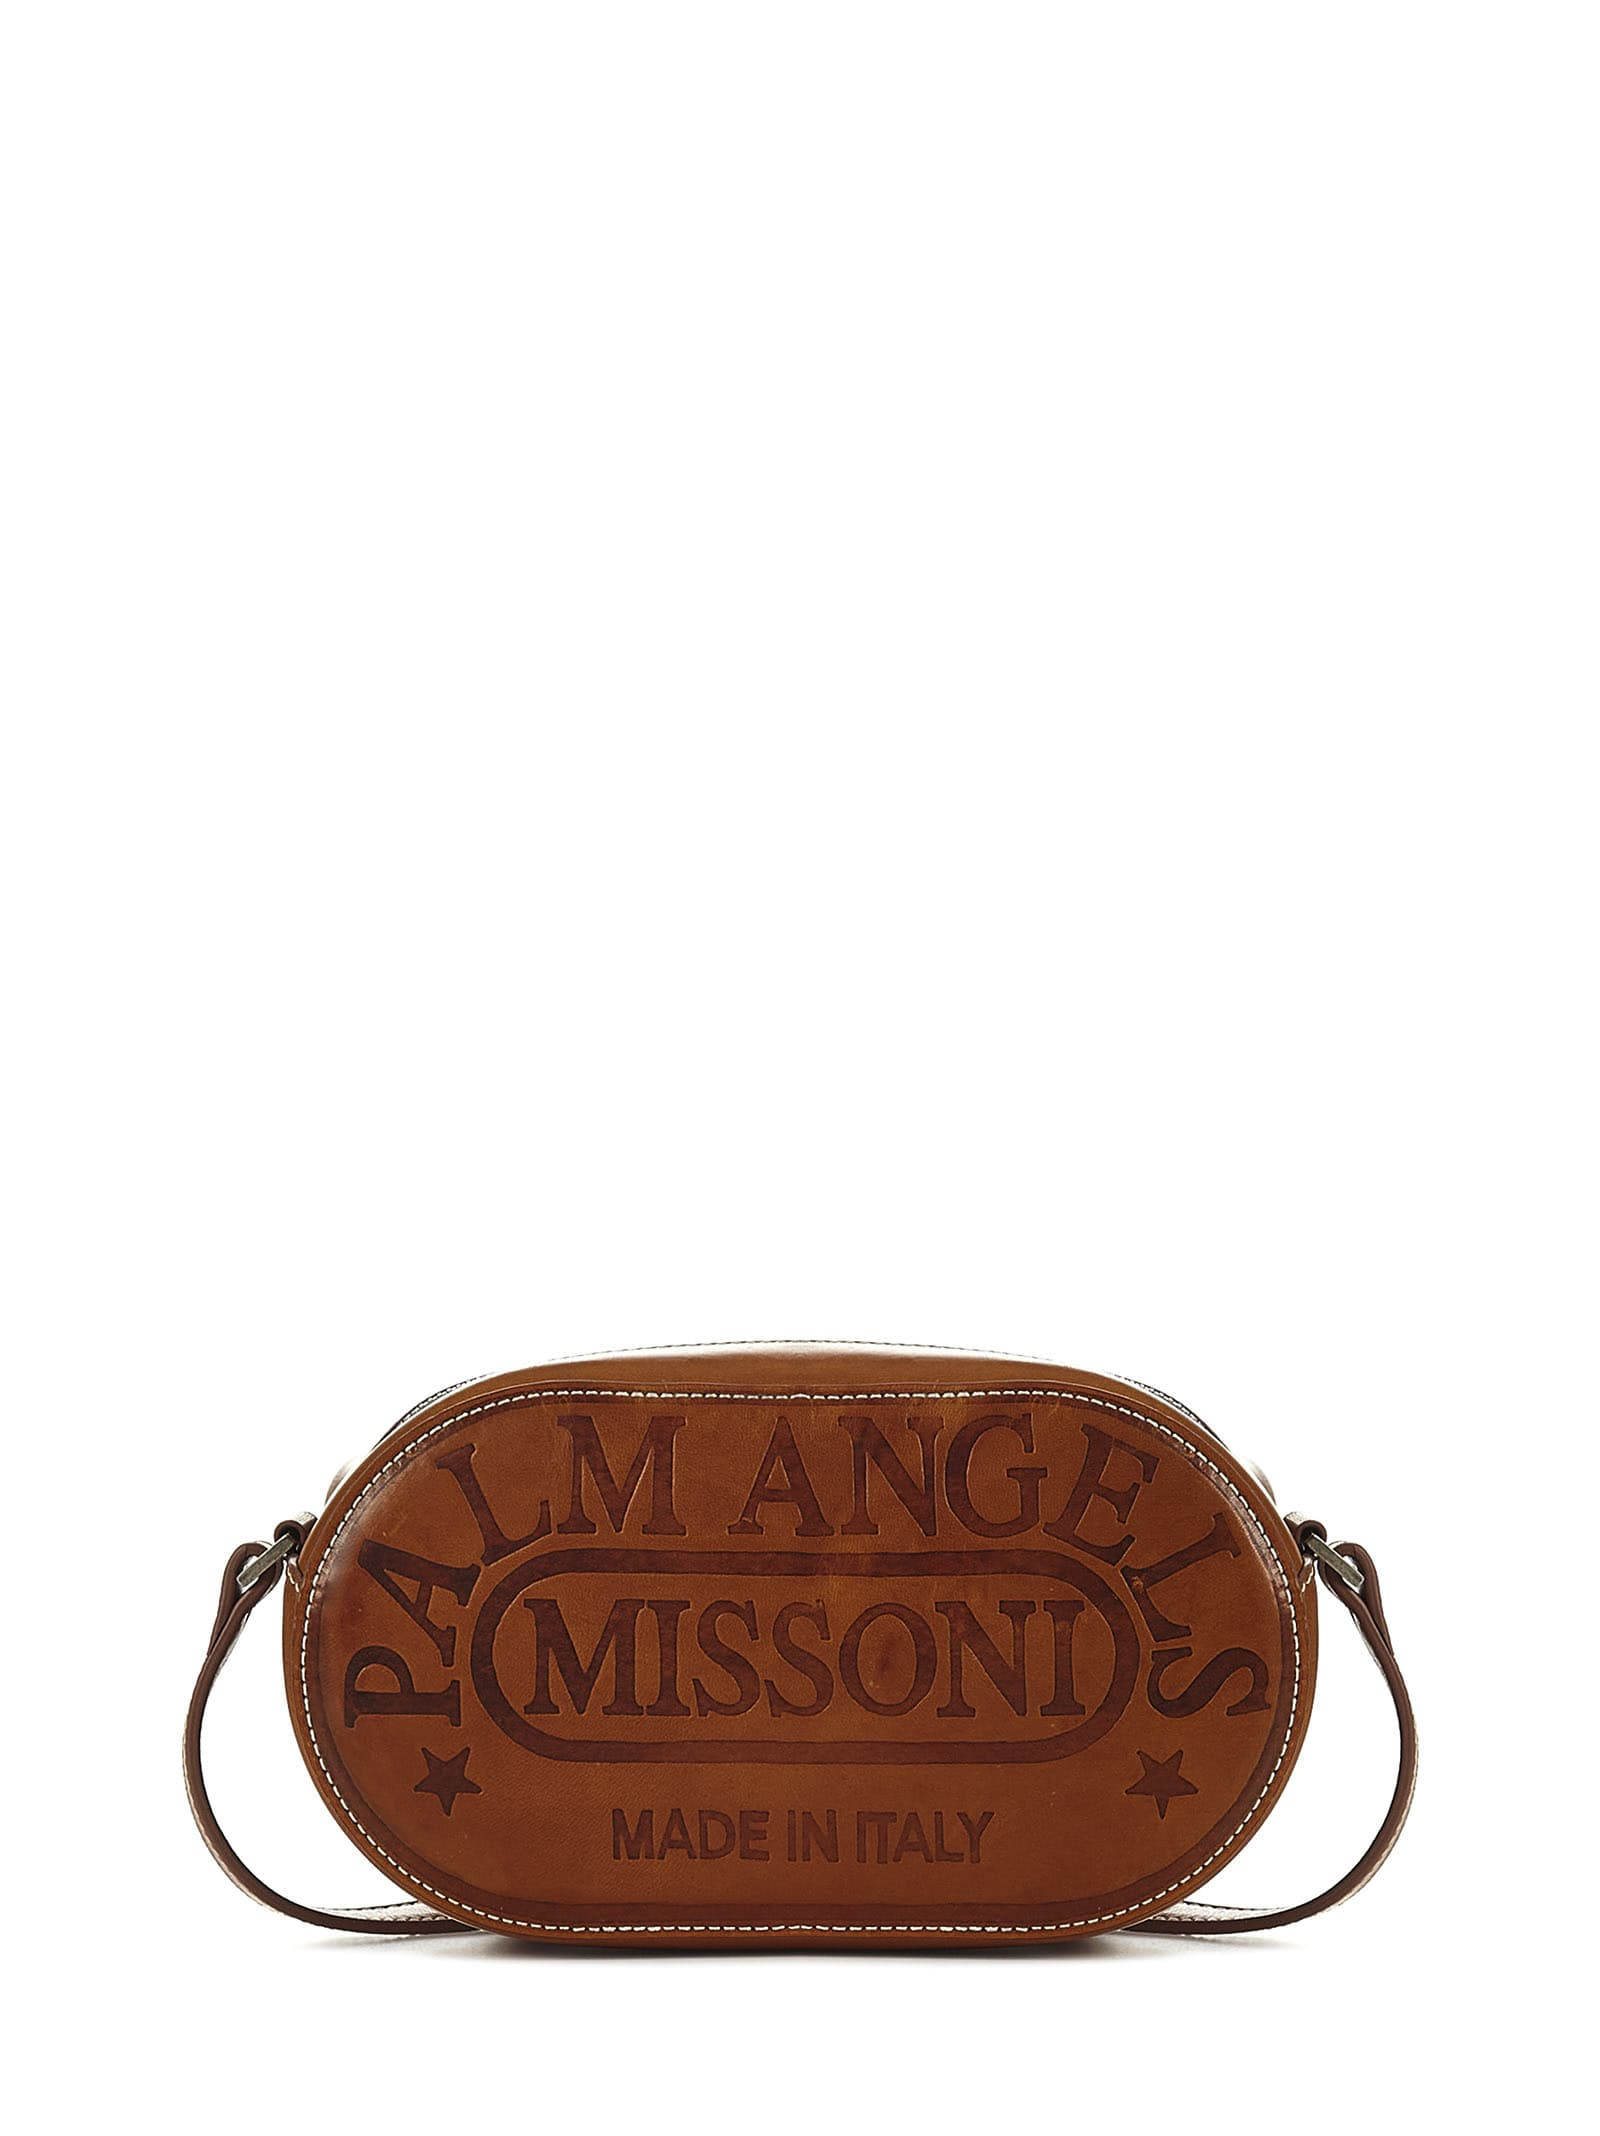 Palm Angels X Missoni Shoulder Bag